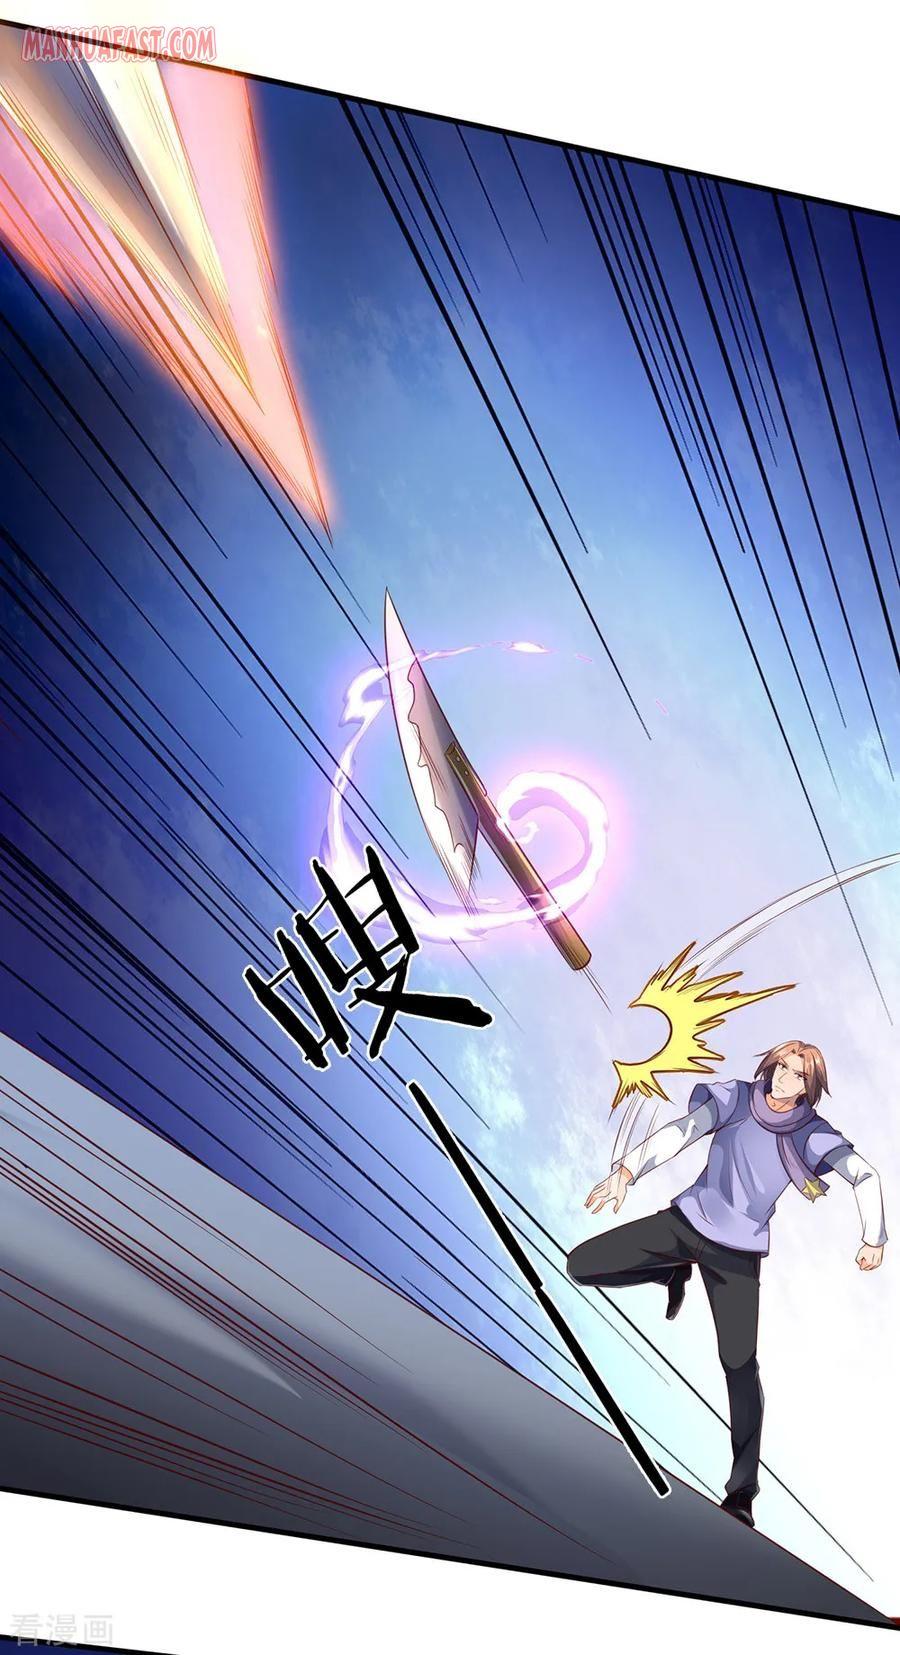 https://manga.mangadogs.com/comics/pic4/39/32615/2841470/6b247abc8be9f278b078413009da554b.jpg Page 1